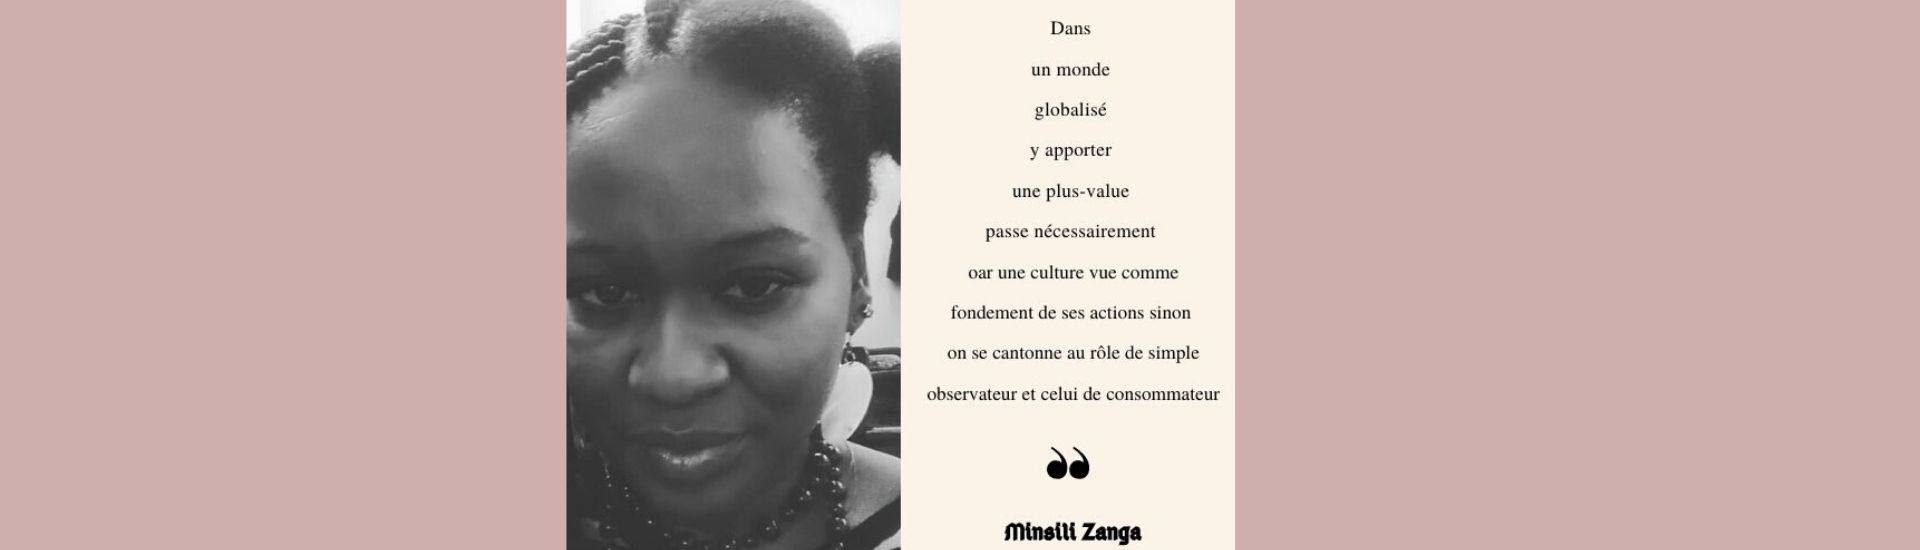 Minsili Zanga quotes : culture et identité